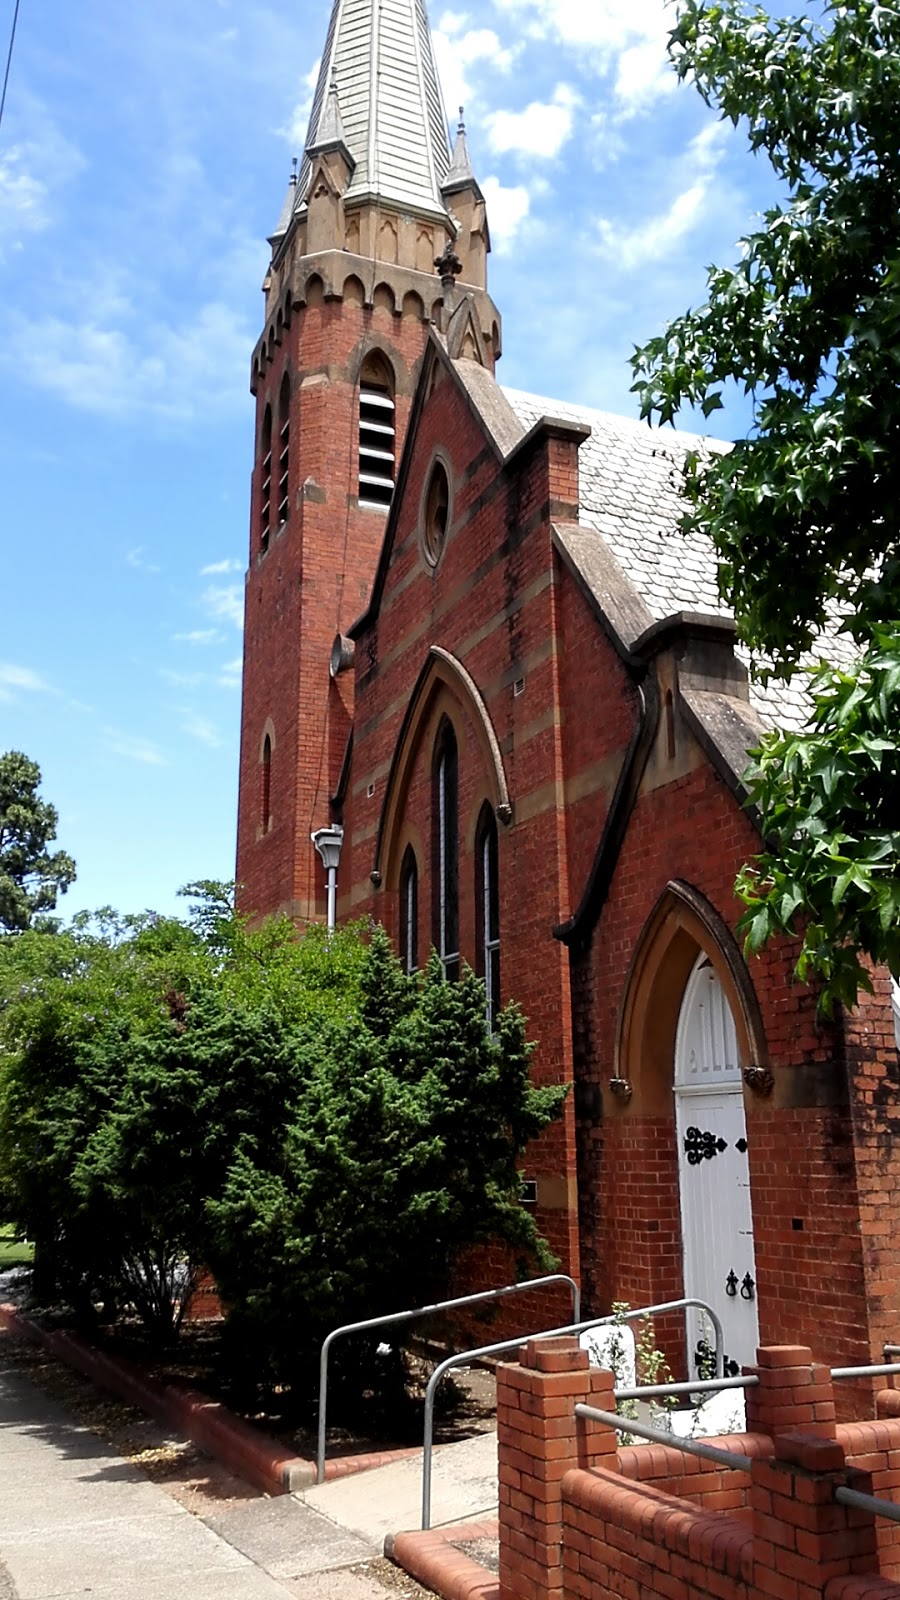 Saint Johns Uniting Church | church | 39 Douglas St, Narrandera NSW 2700, Australia | 0269592097 OR +61 2 6959 2097